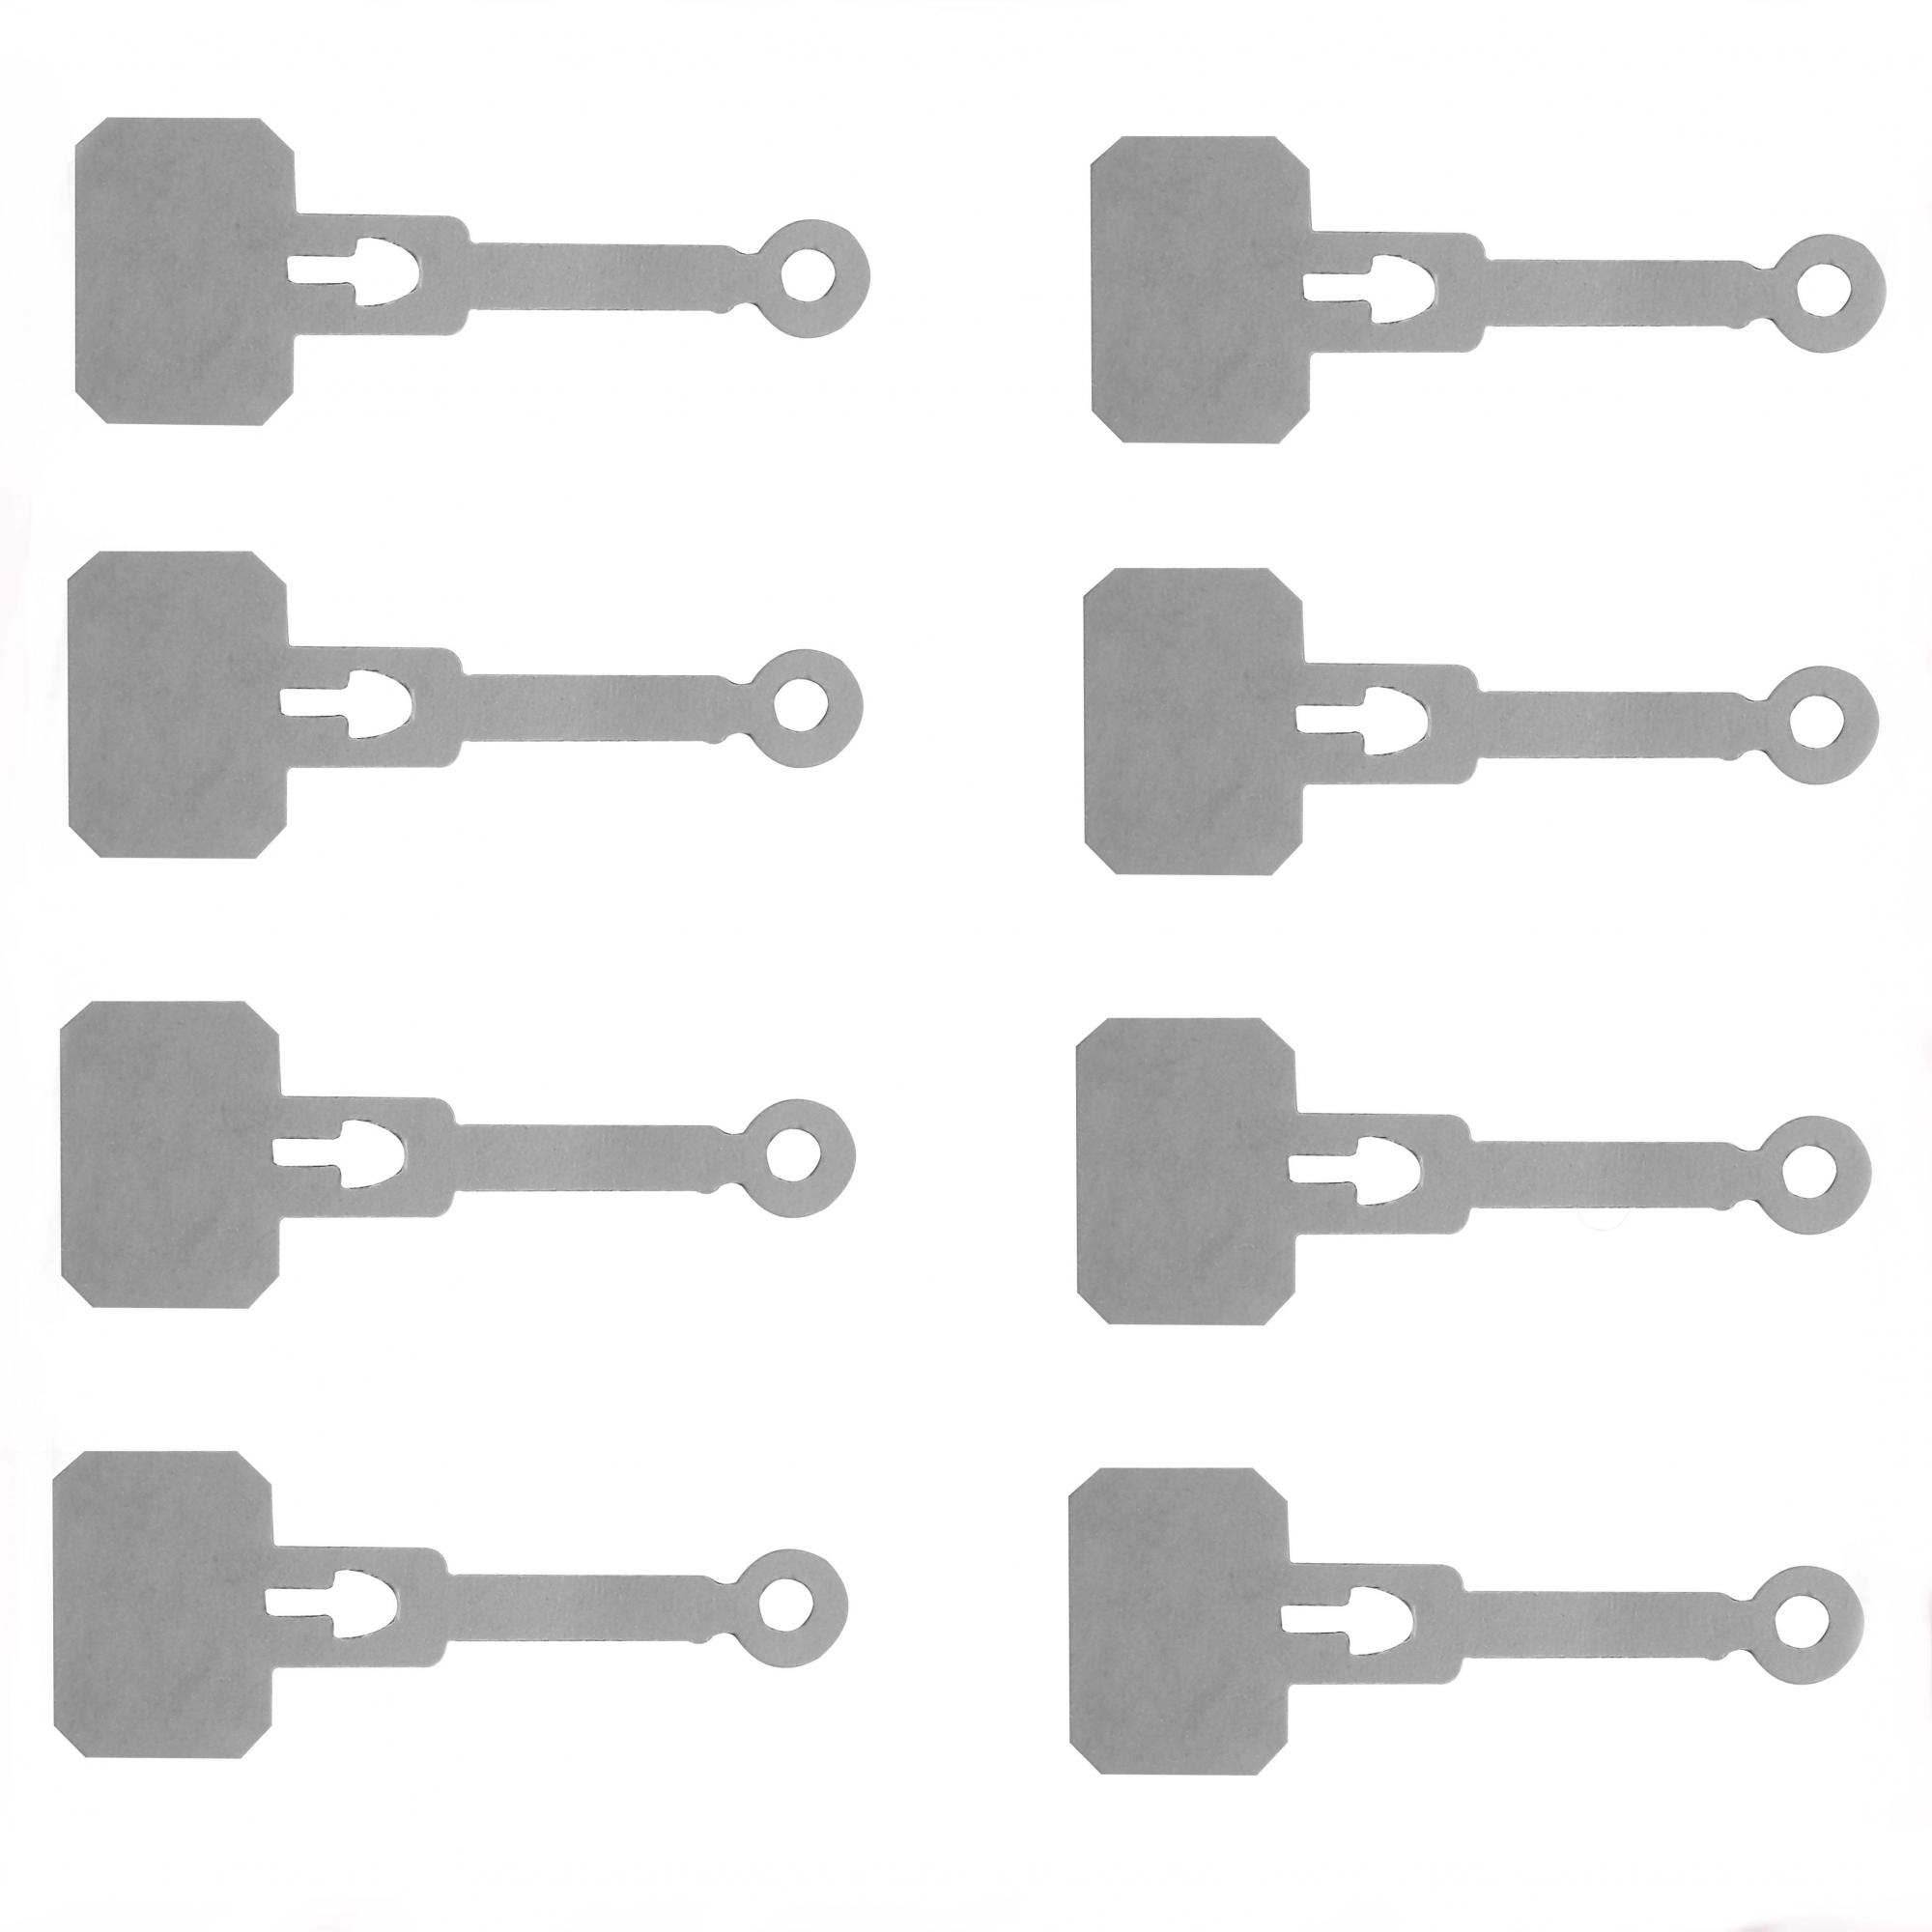 Etiqueta Tag para Anel - Pct com 1.000 unidades  - Lunozê Joias